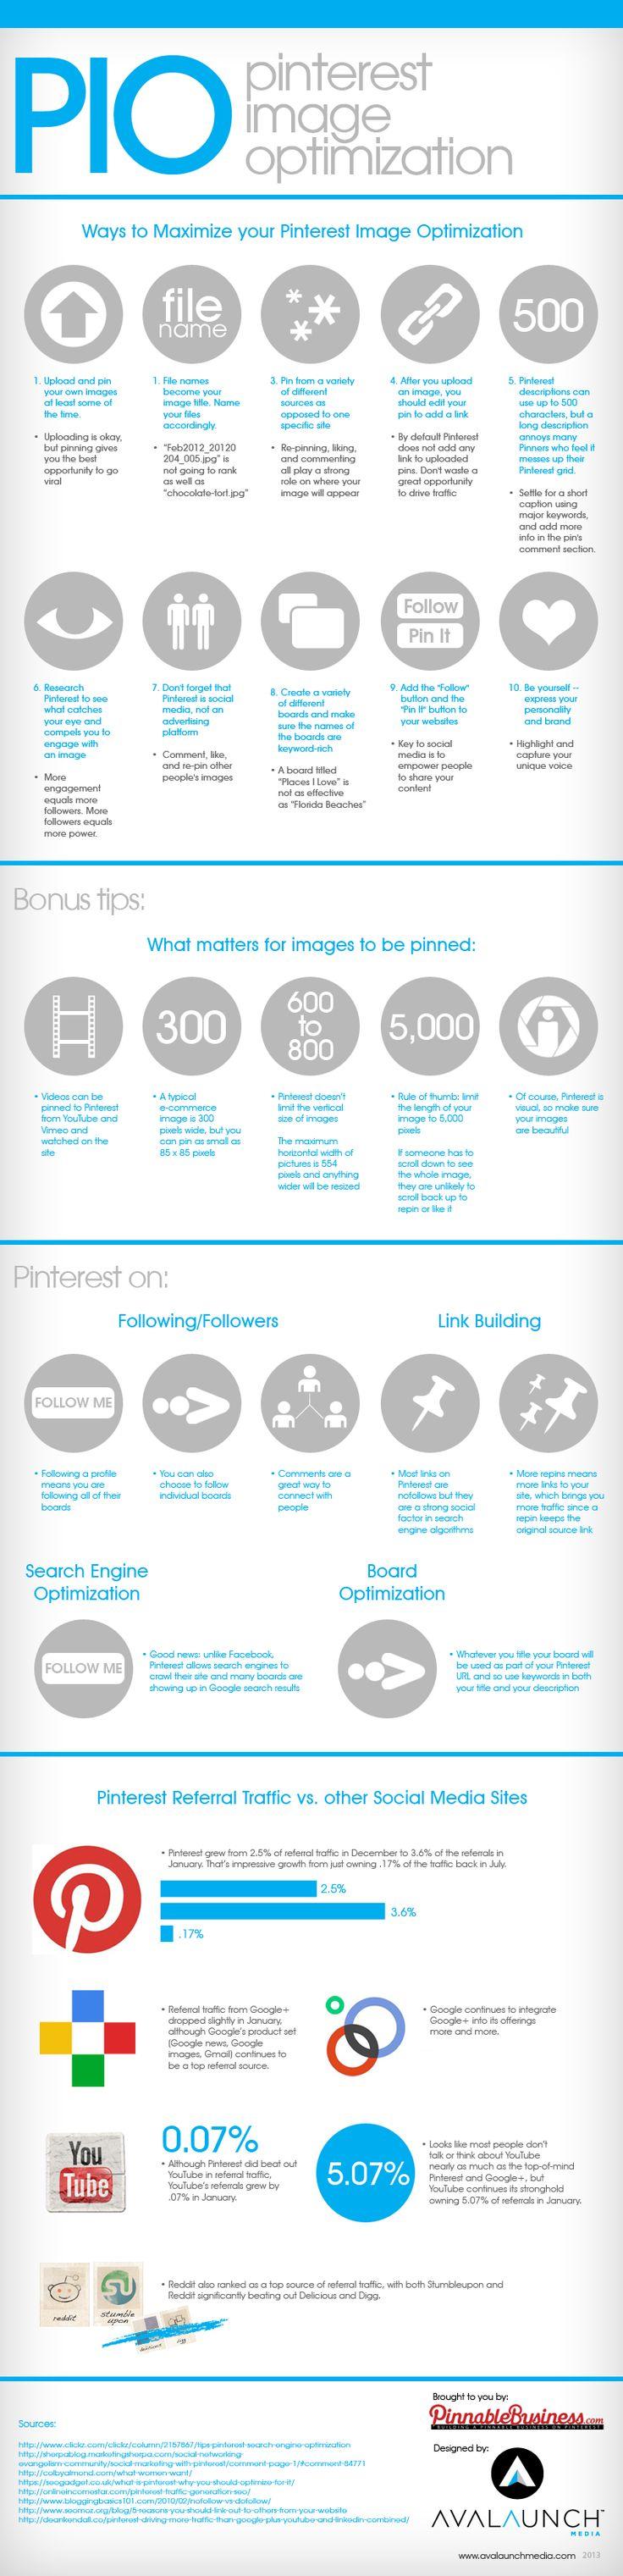 18 Tips for Optimizing Your #Pinterest Images to Improve SEO | Pamorama | #SocialMedia Marketing Blog